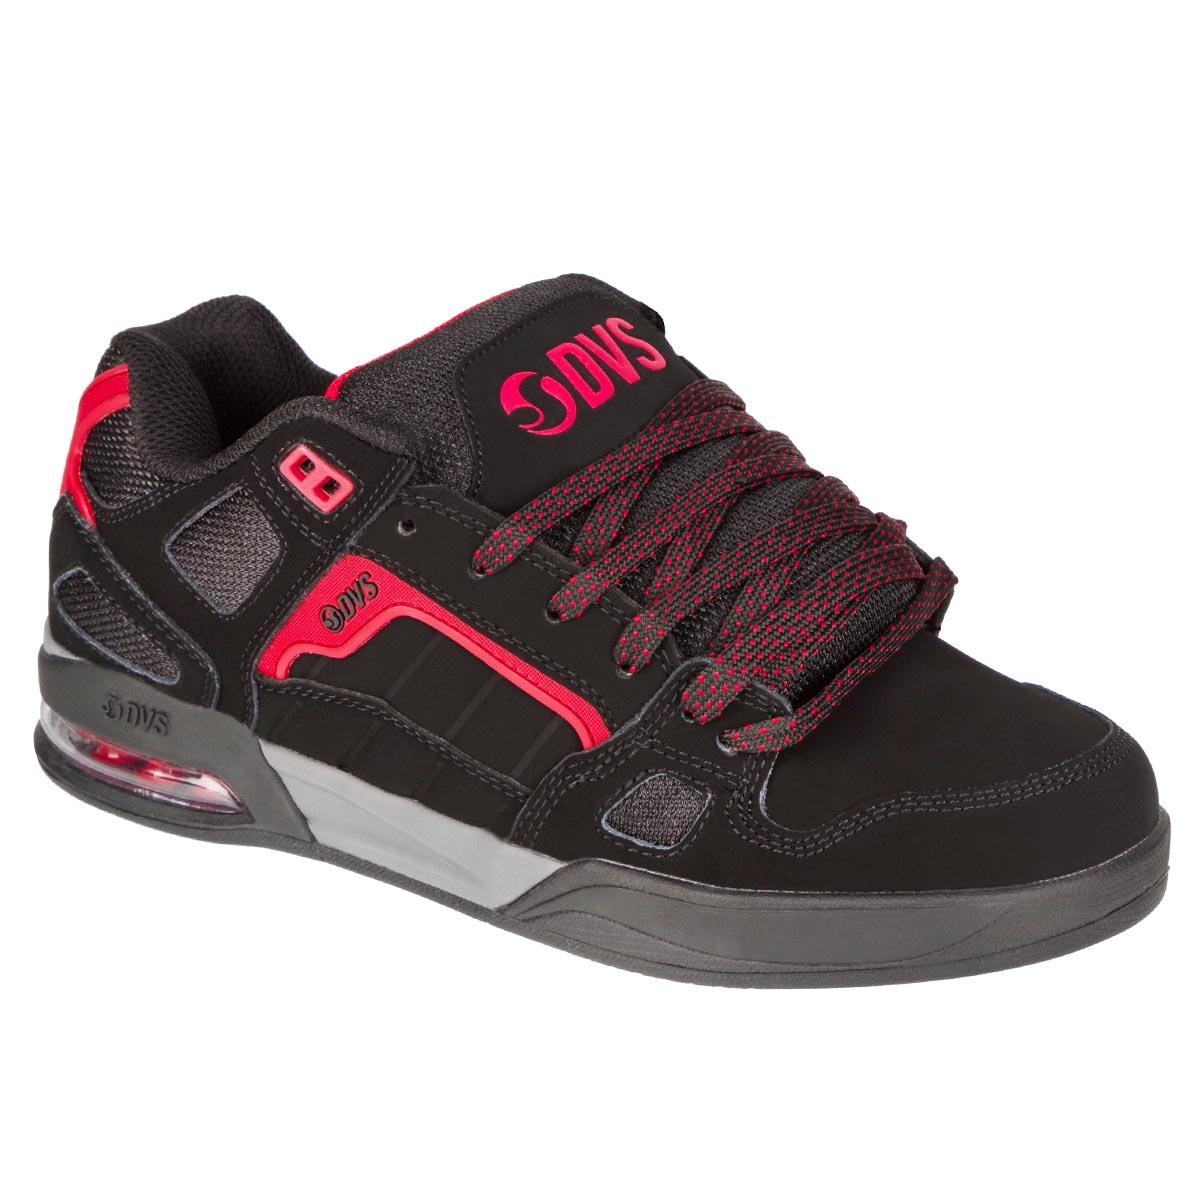 DVS Schuhe Drone+ Black Red Nubuck